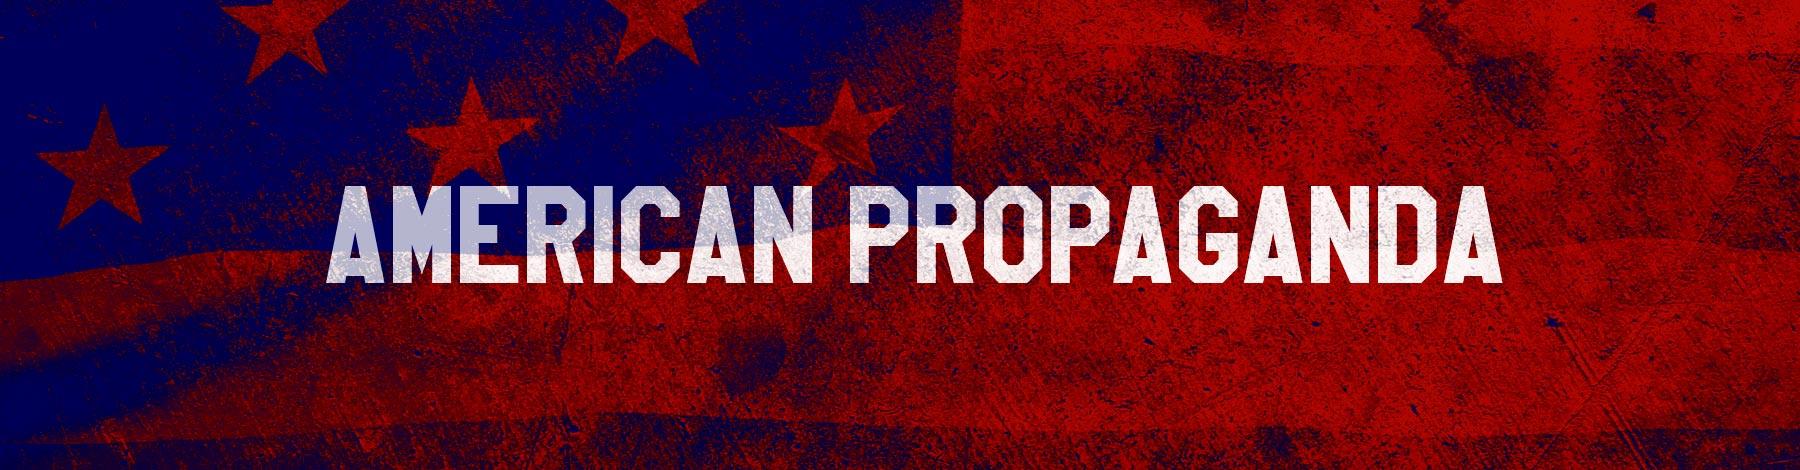 feature-2014-07-propaganda